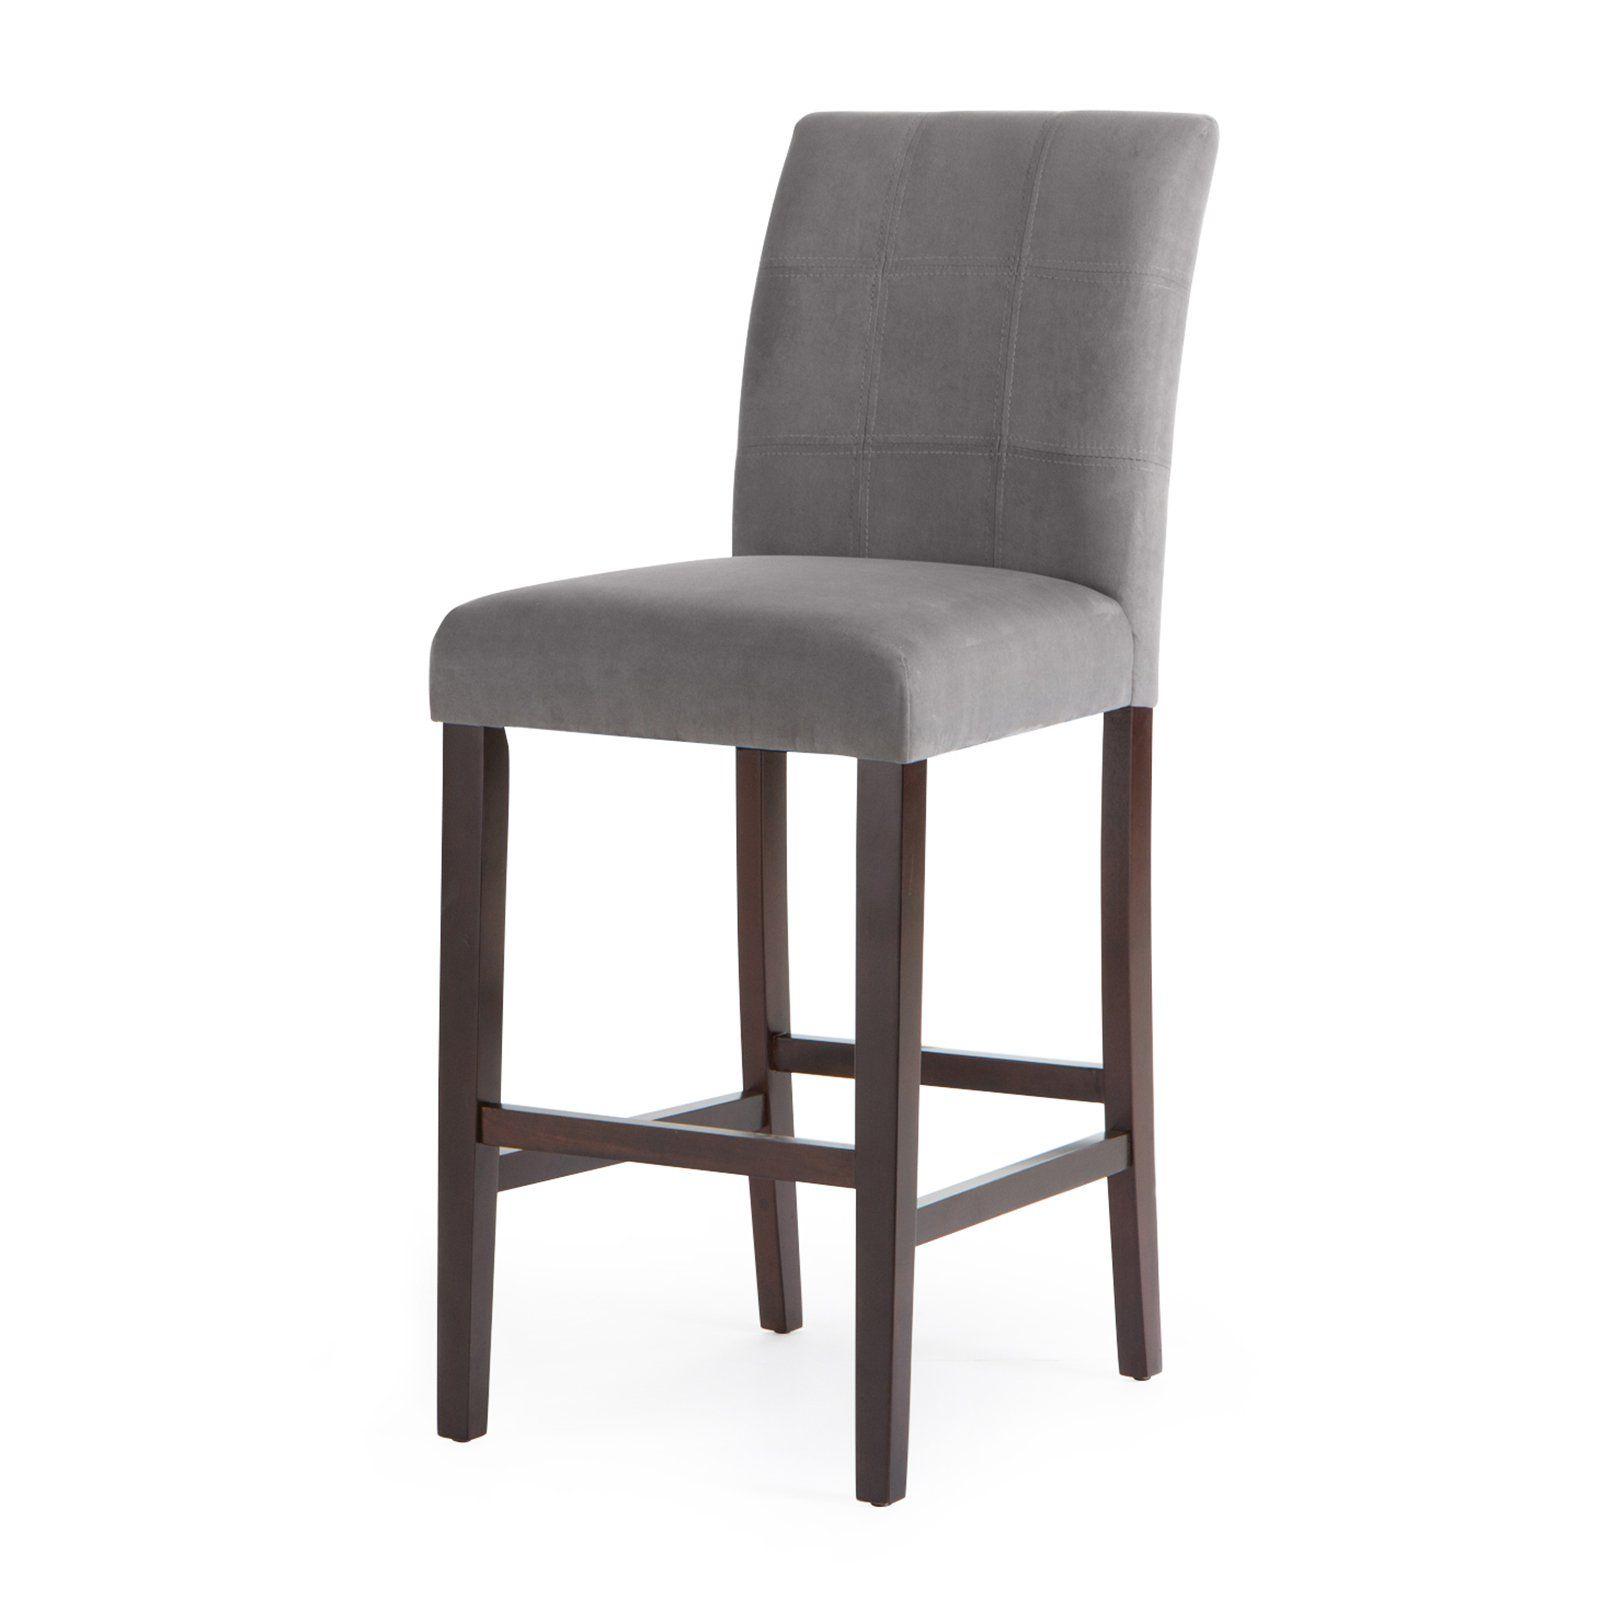 Hocker Bar Stuhl | Stühle | Pinterest | Stuhl, Hocker und Bar